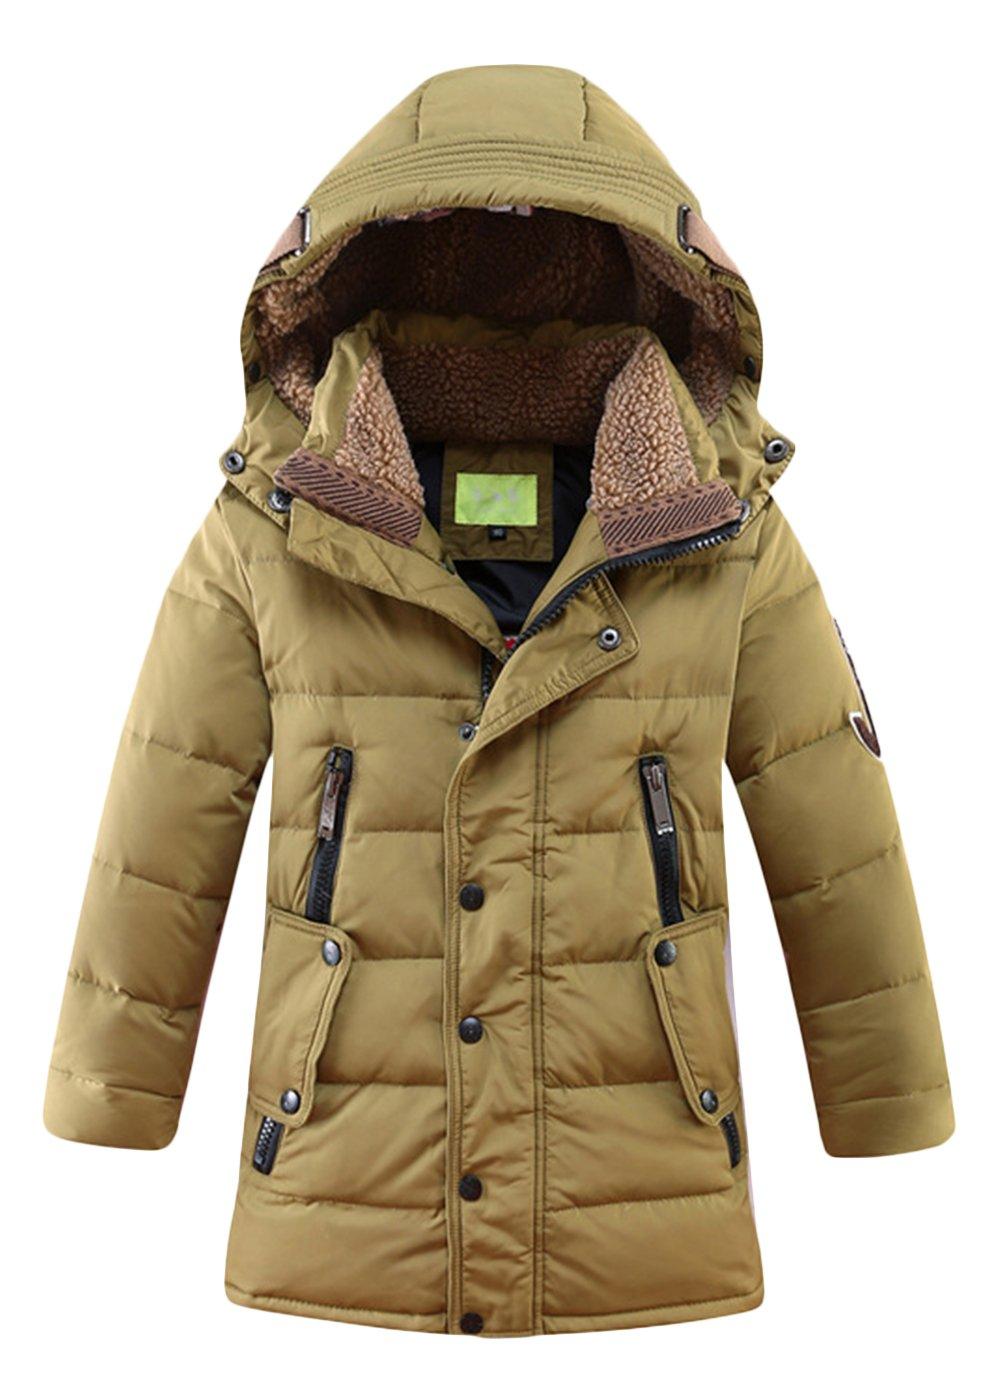 OUO Daunenjacke f/ür Kinder k/älteschutz Lange Jacke mit abnehmbar Kapuze